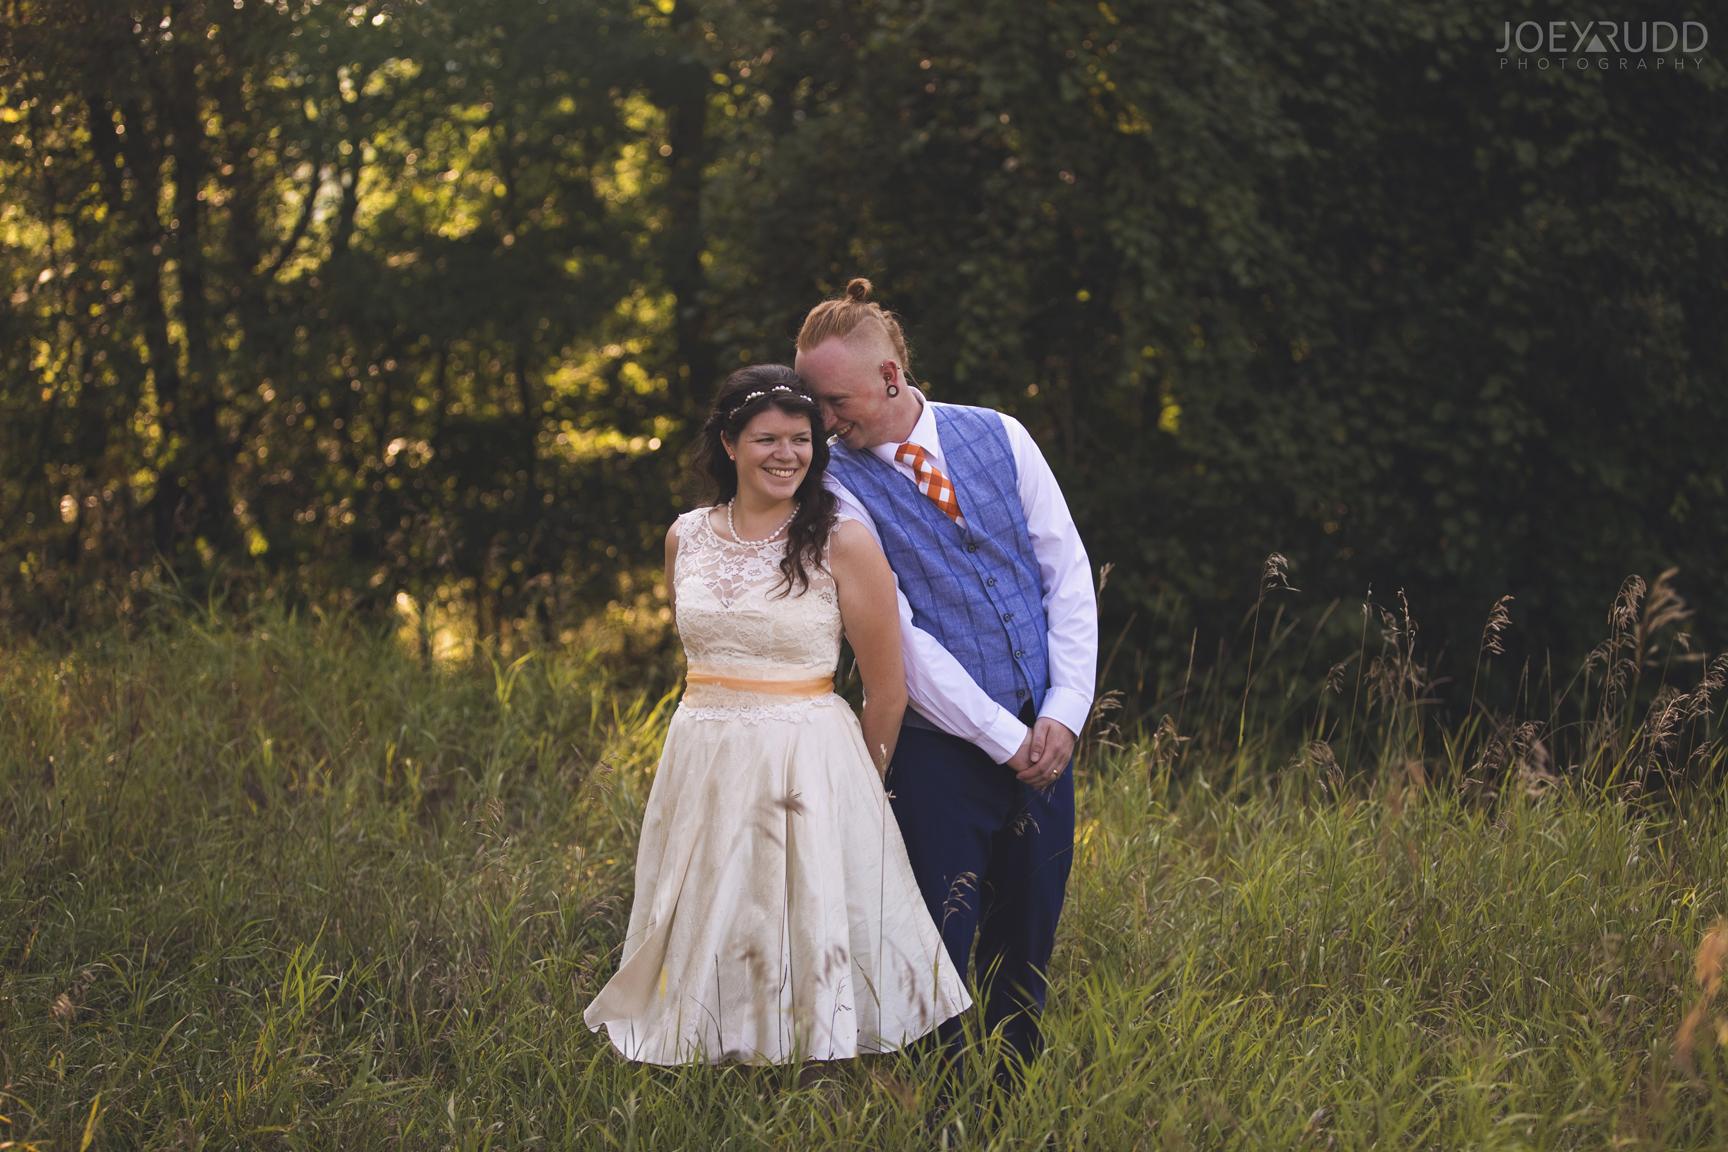 Backyard Kingston Wedding by Ottawa Wedding Photographer Joey Rudd Photography Cute